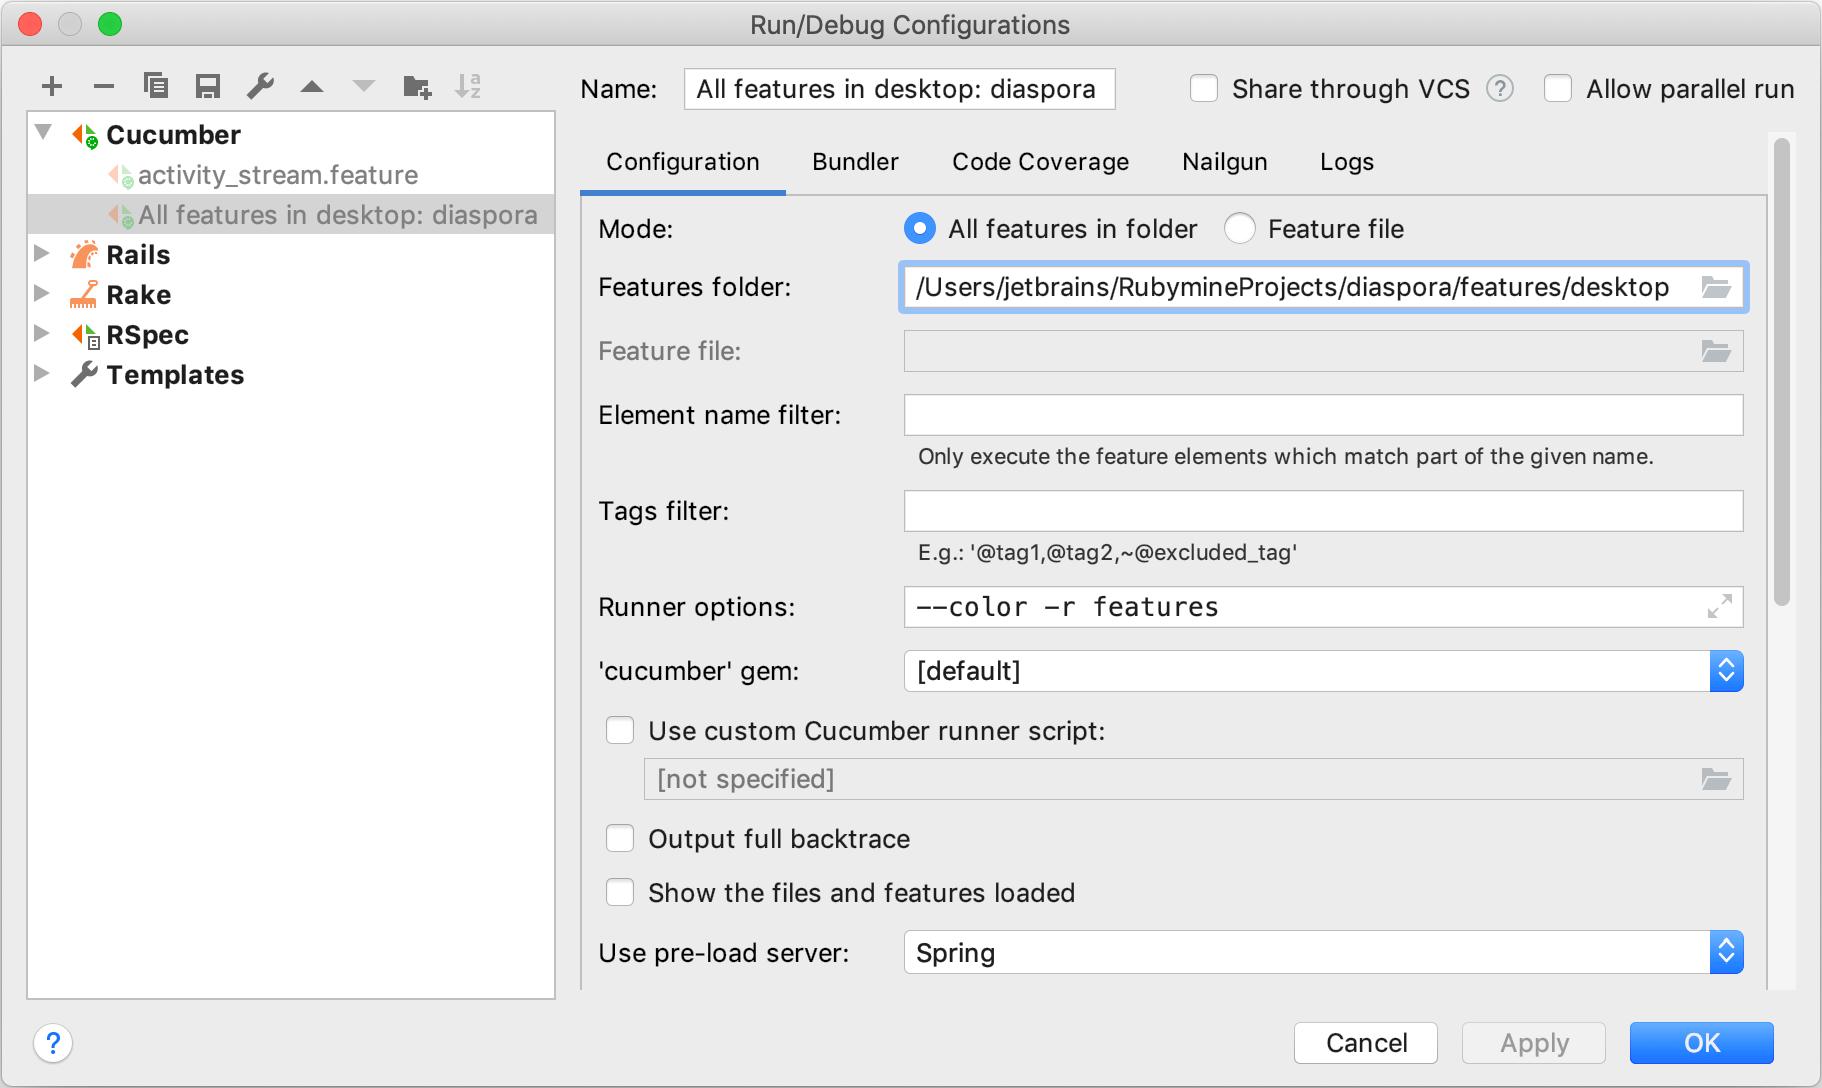 Run/Debug Configurations